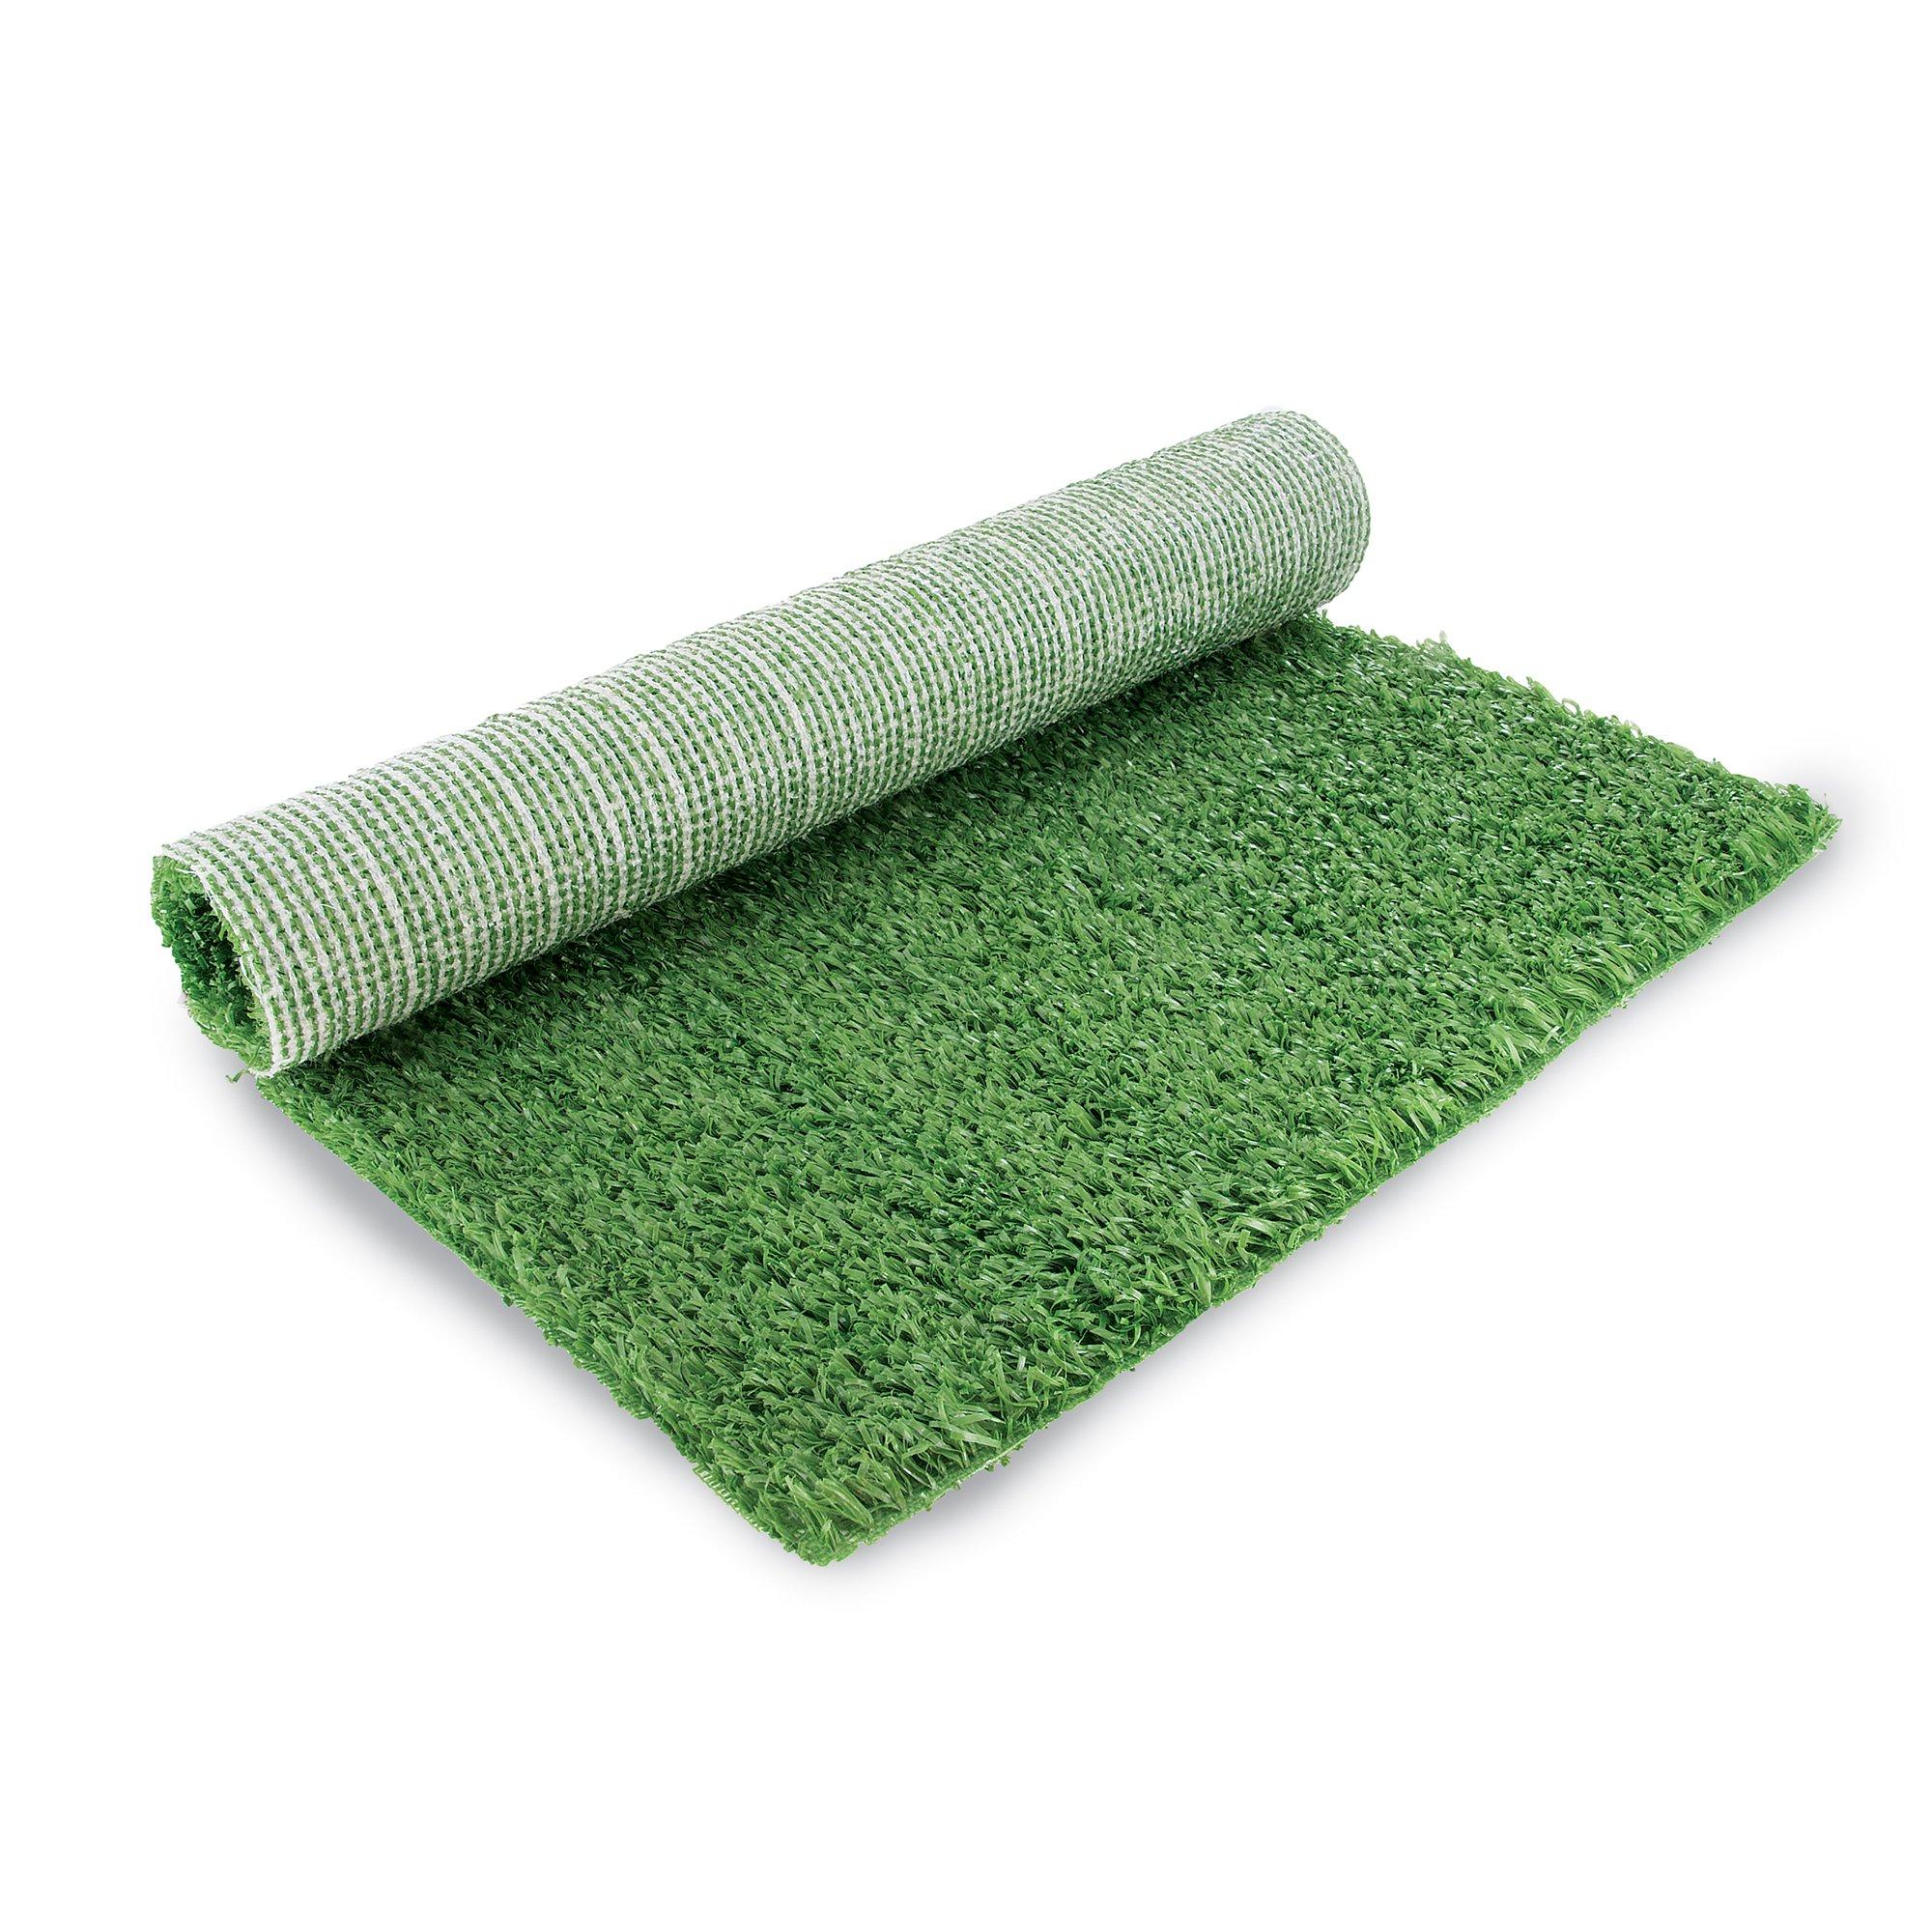 Pet Loo Replacement Grass Large